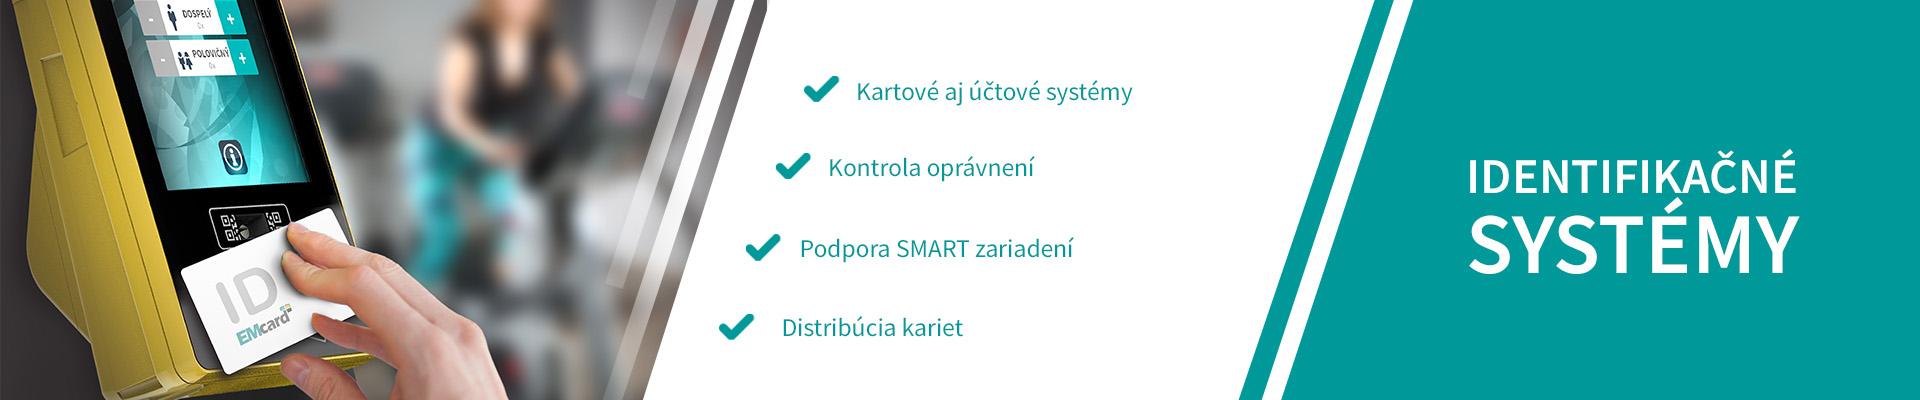 identifikacne_systemy_01_sk